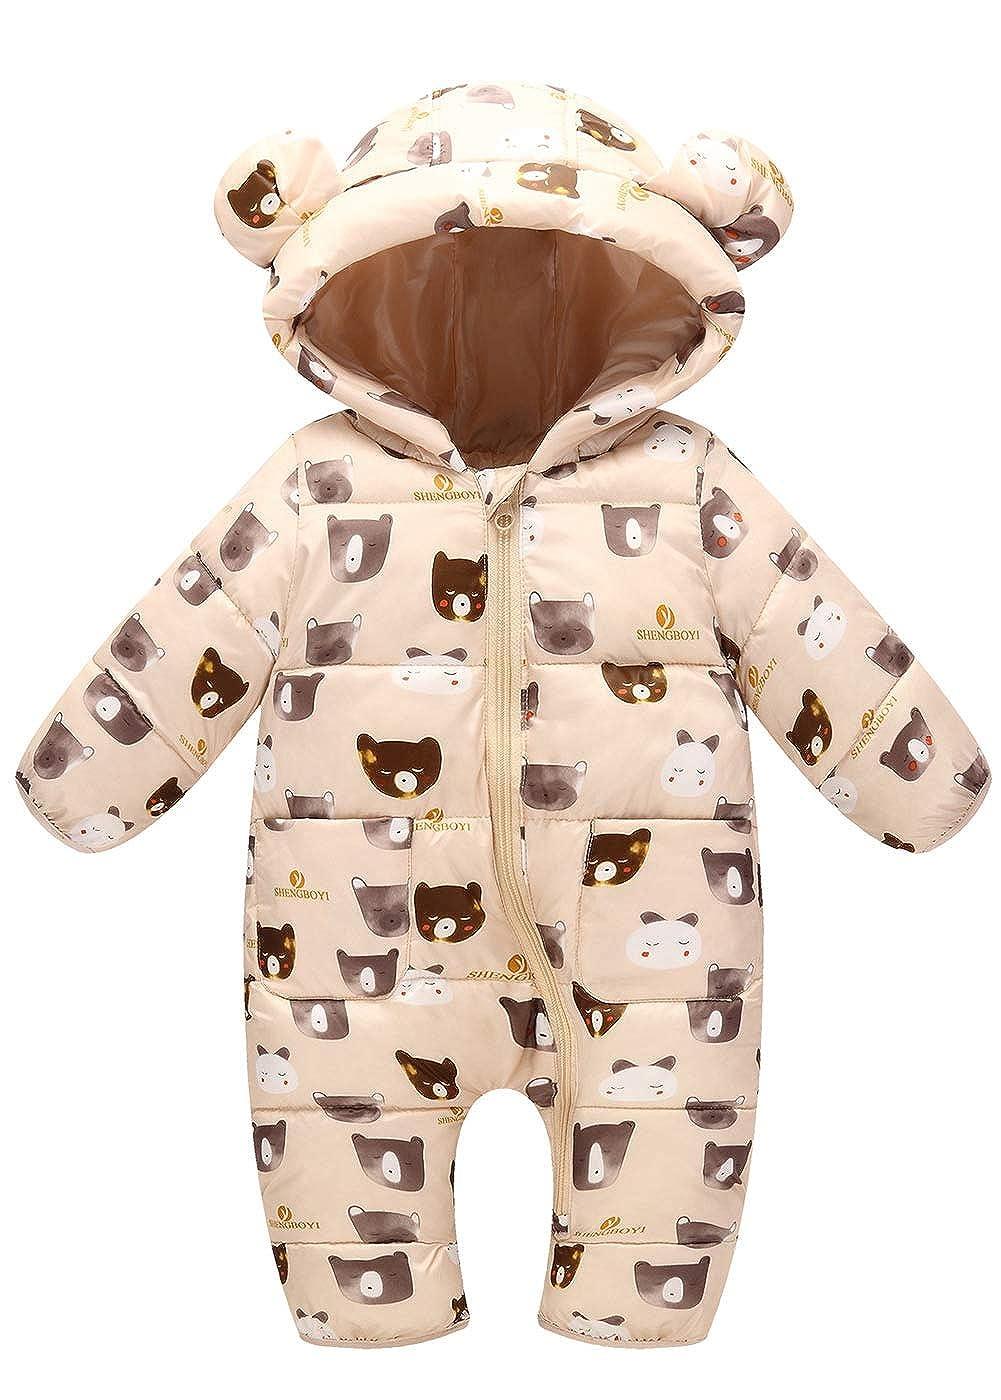 Happy Cherry Baby's Winter Hooded Bodysuit Warm Snowsuit Jumpsuit 0-24 Months